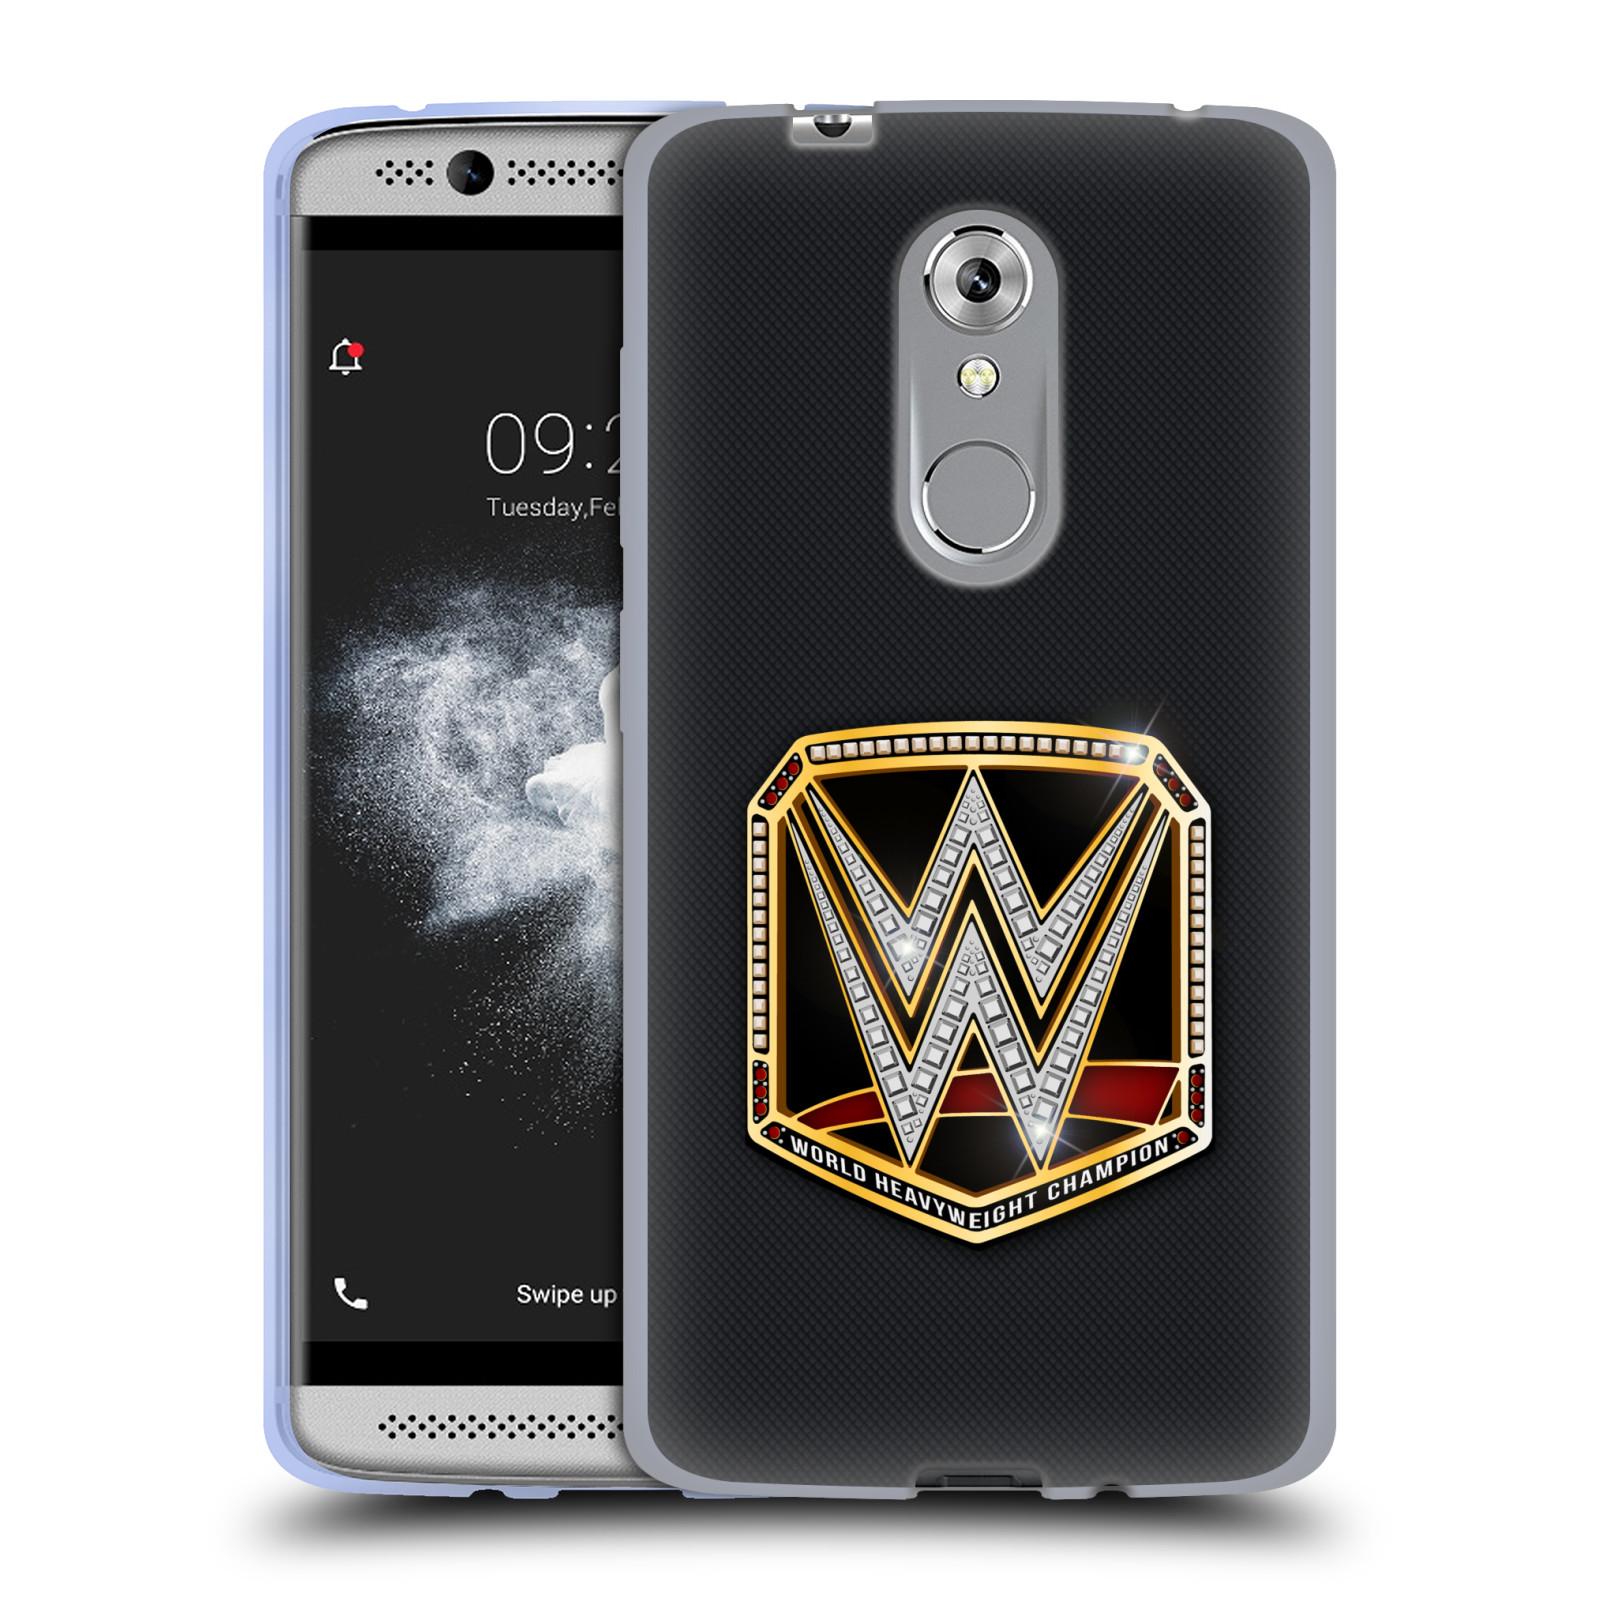 OFFICIAL-WWE-TITLE-BELTS-SOFT-GEL-CASE-FOR-ZTE-PHONES